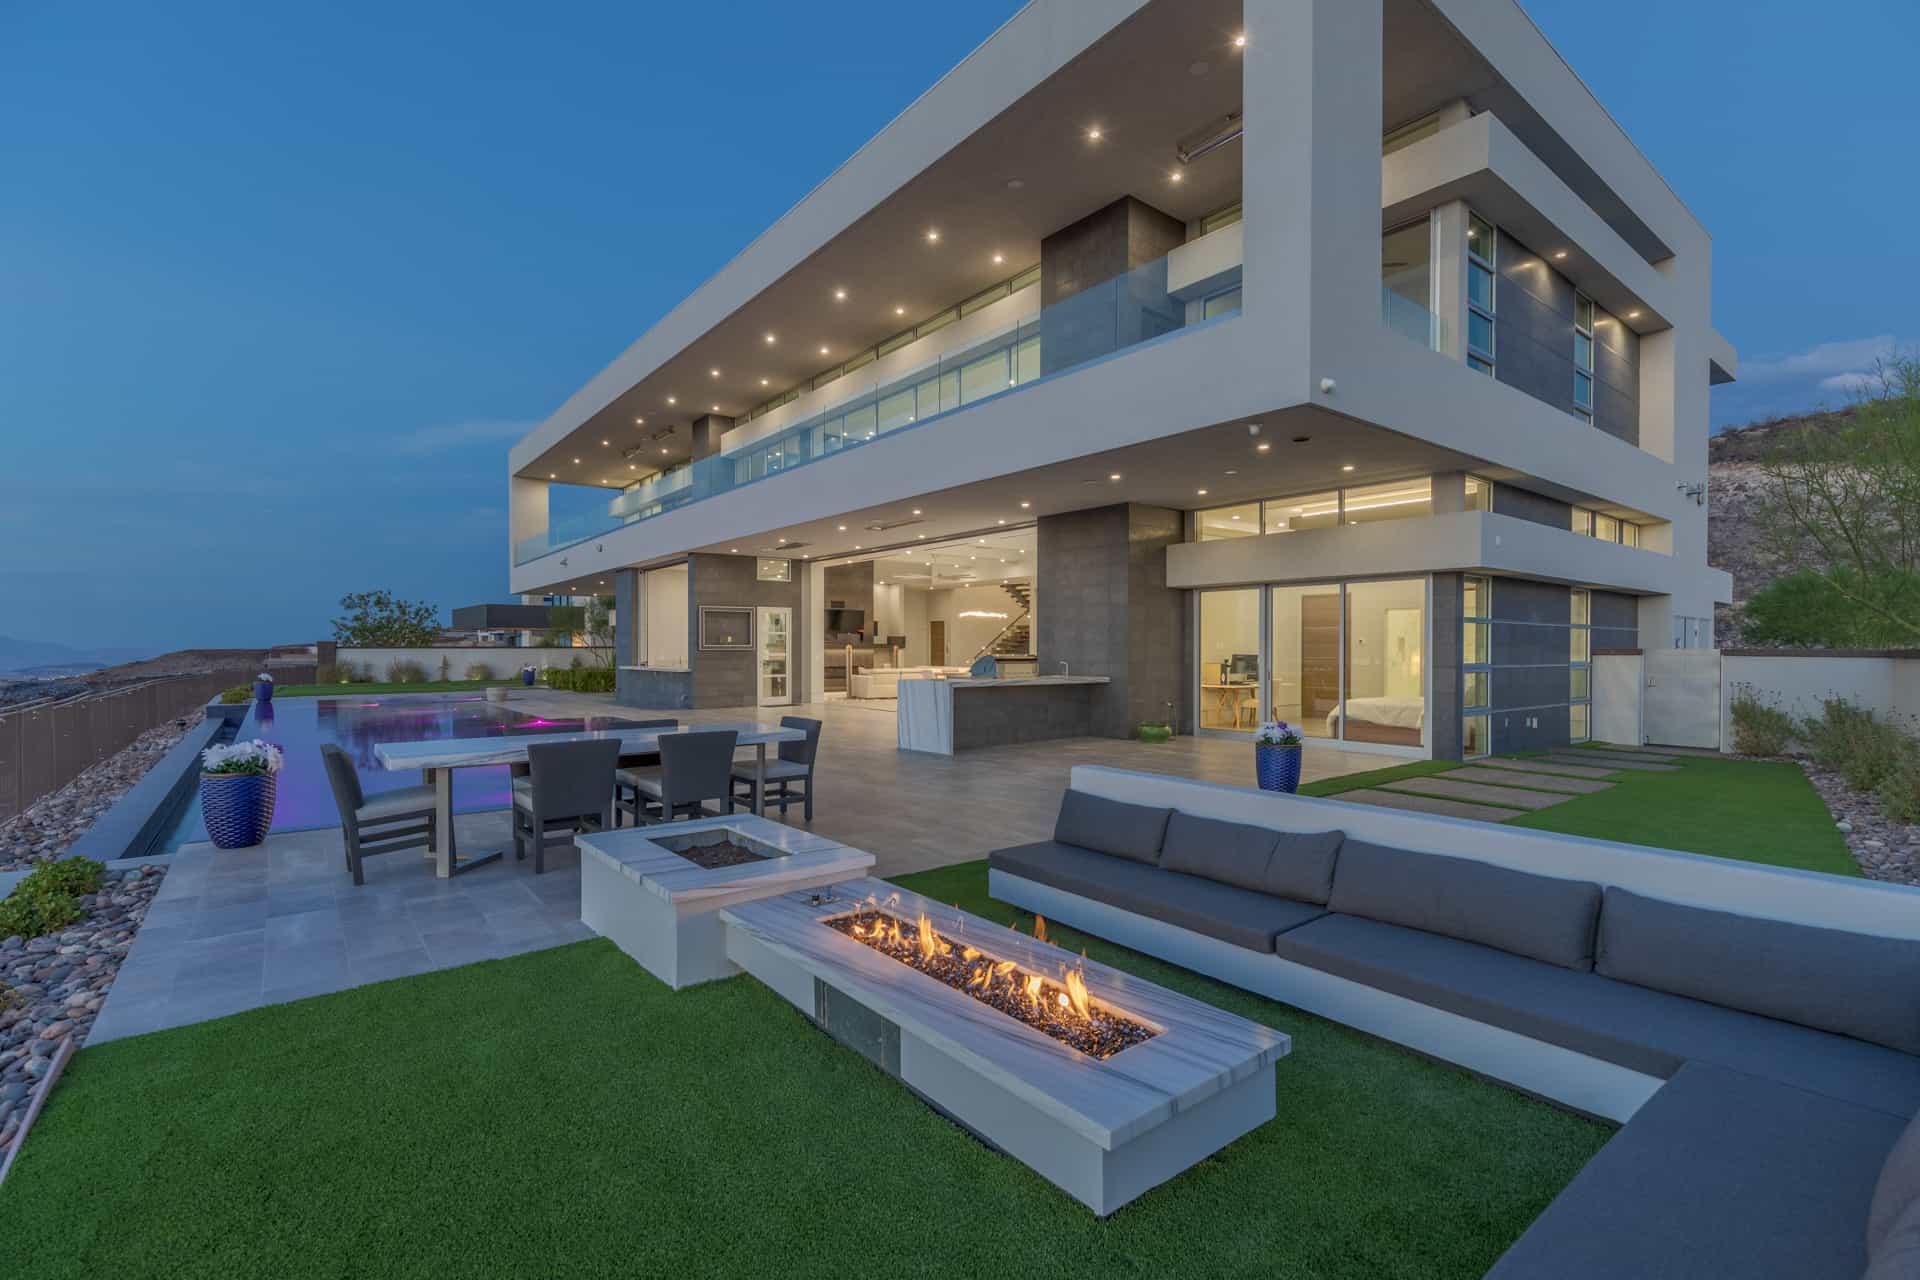 las-vegas-luxry-real-estate-realtor-rob-jensen-company-5-rockstream-drive-ascaya078